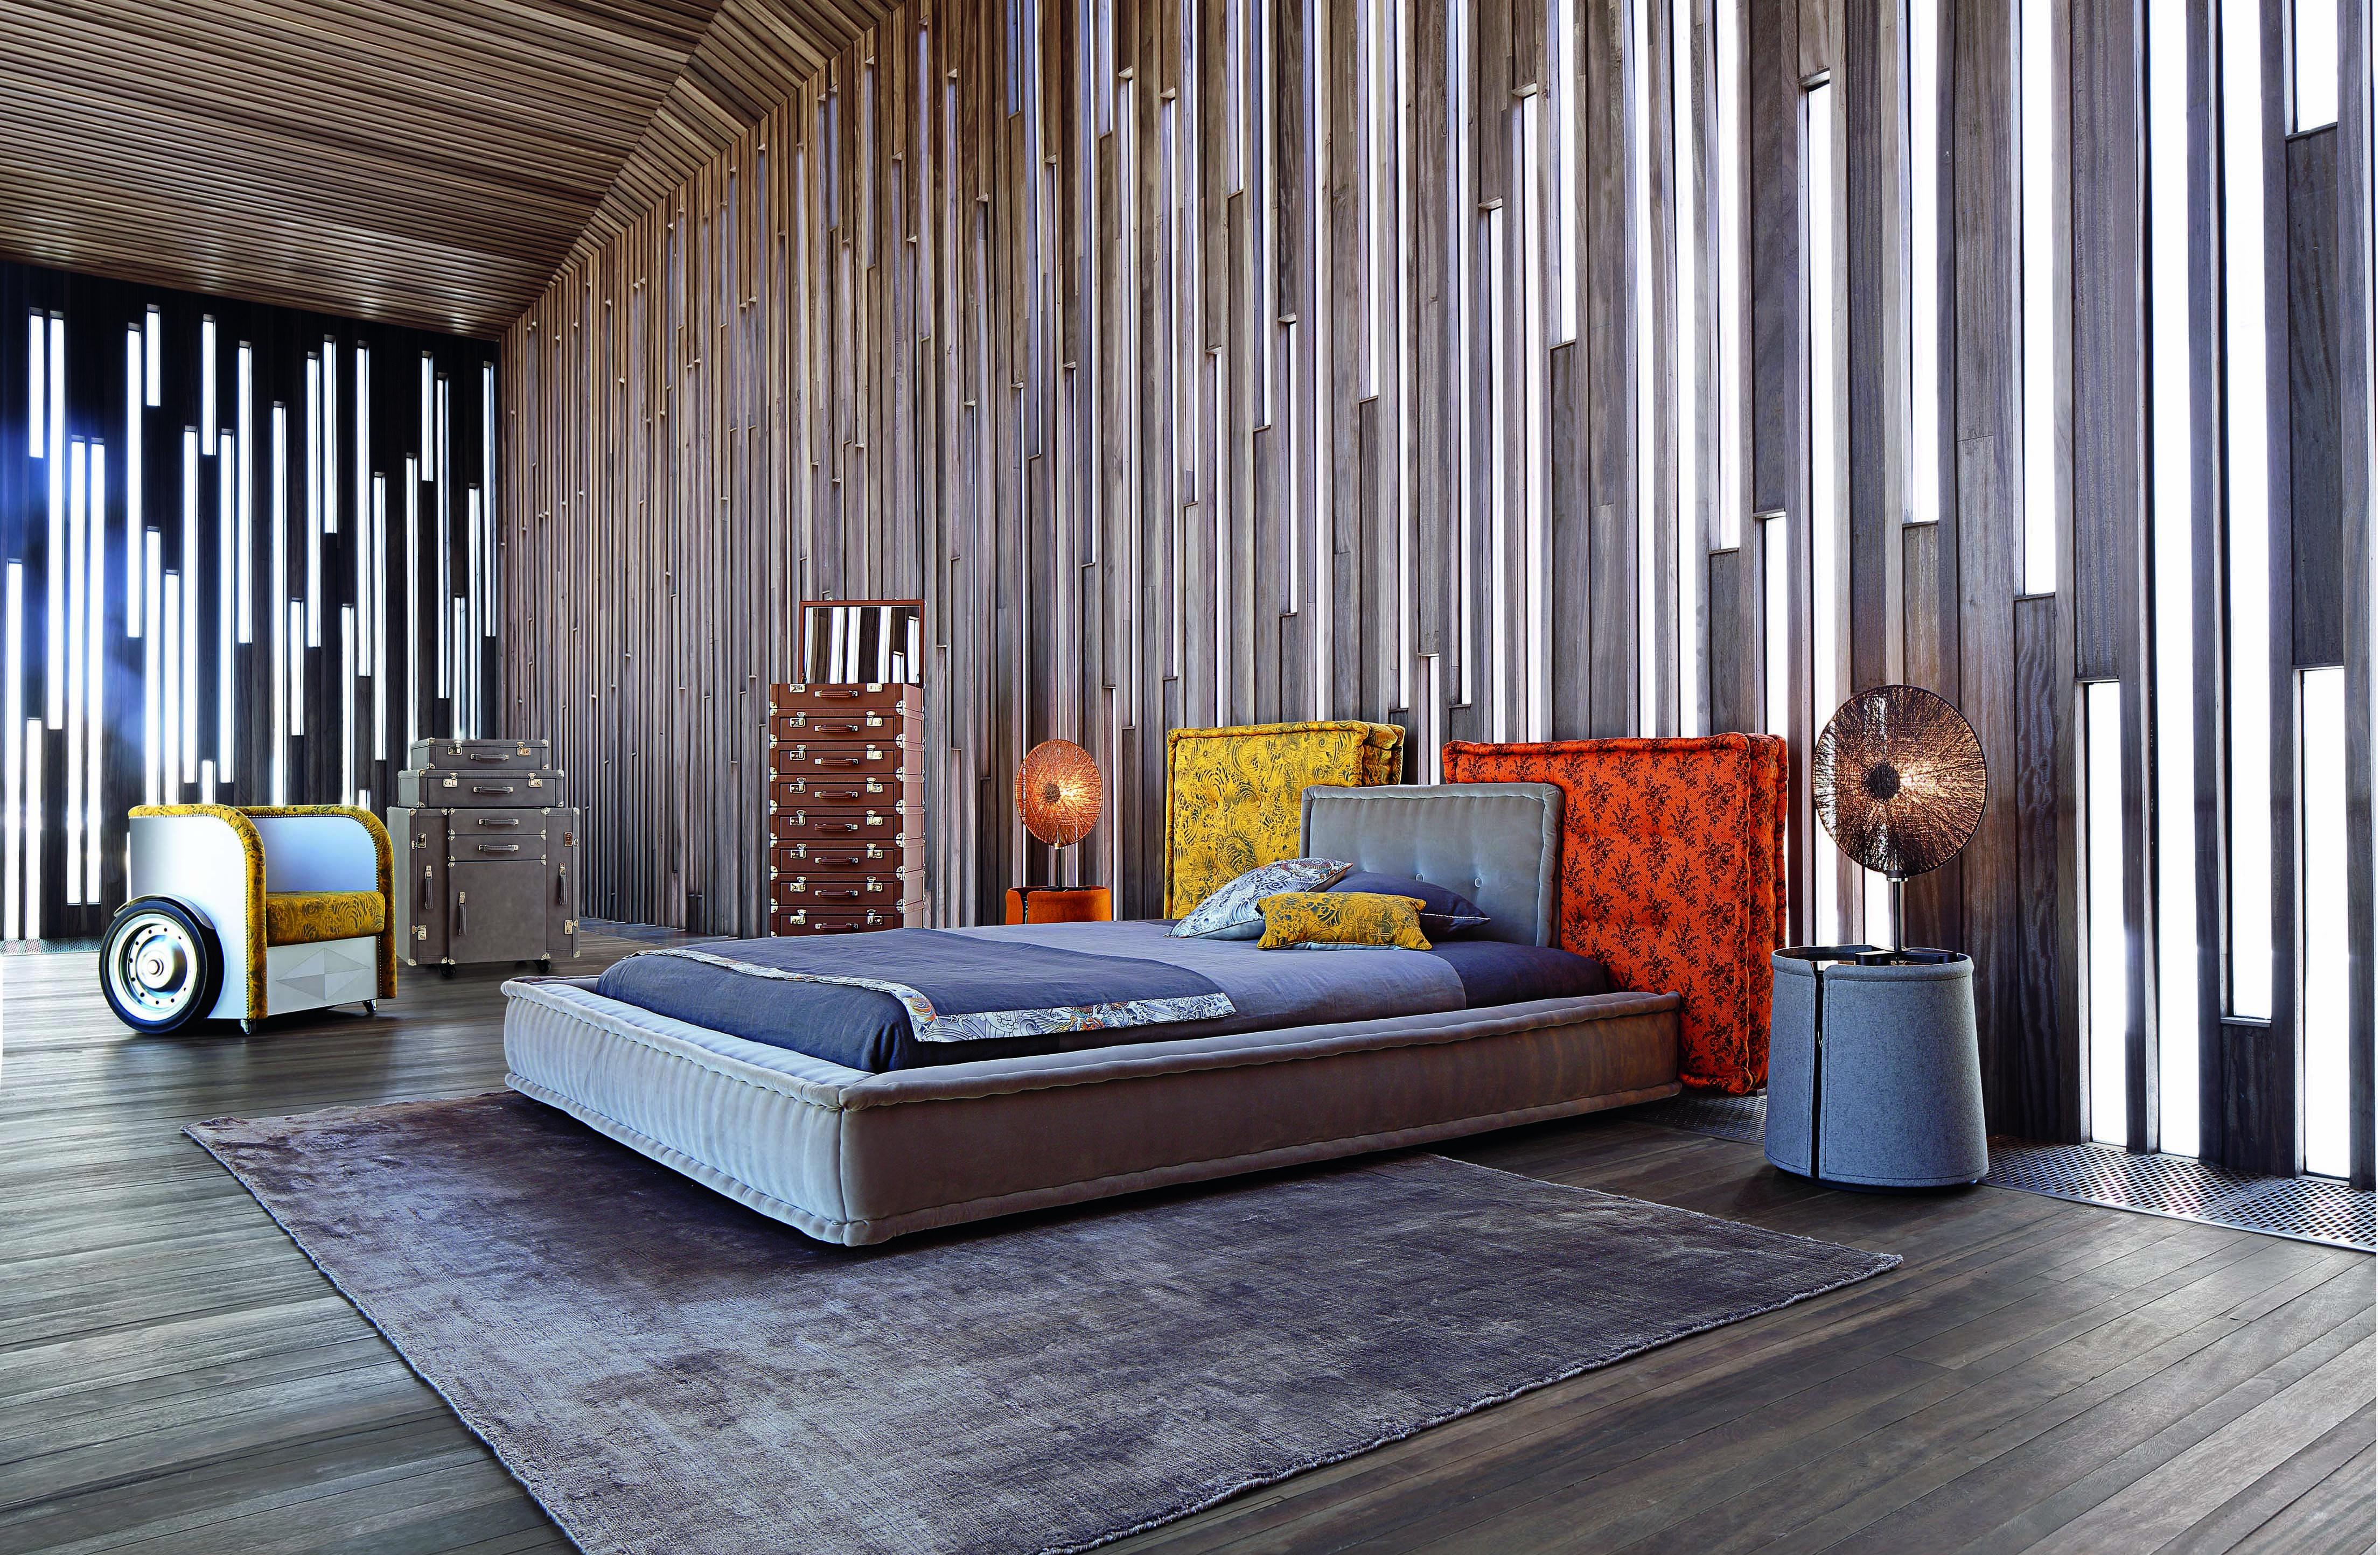 roche bobois mah jong bed upholstered in jean paul gaultier fabrics mahjong bed